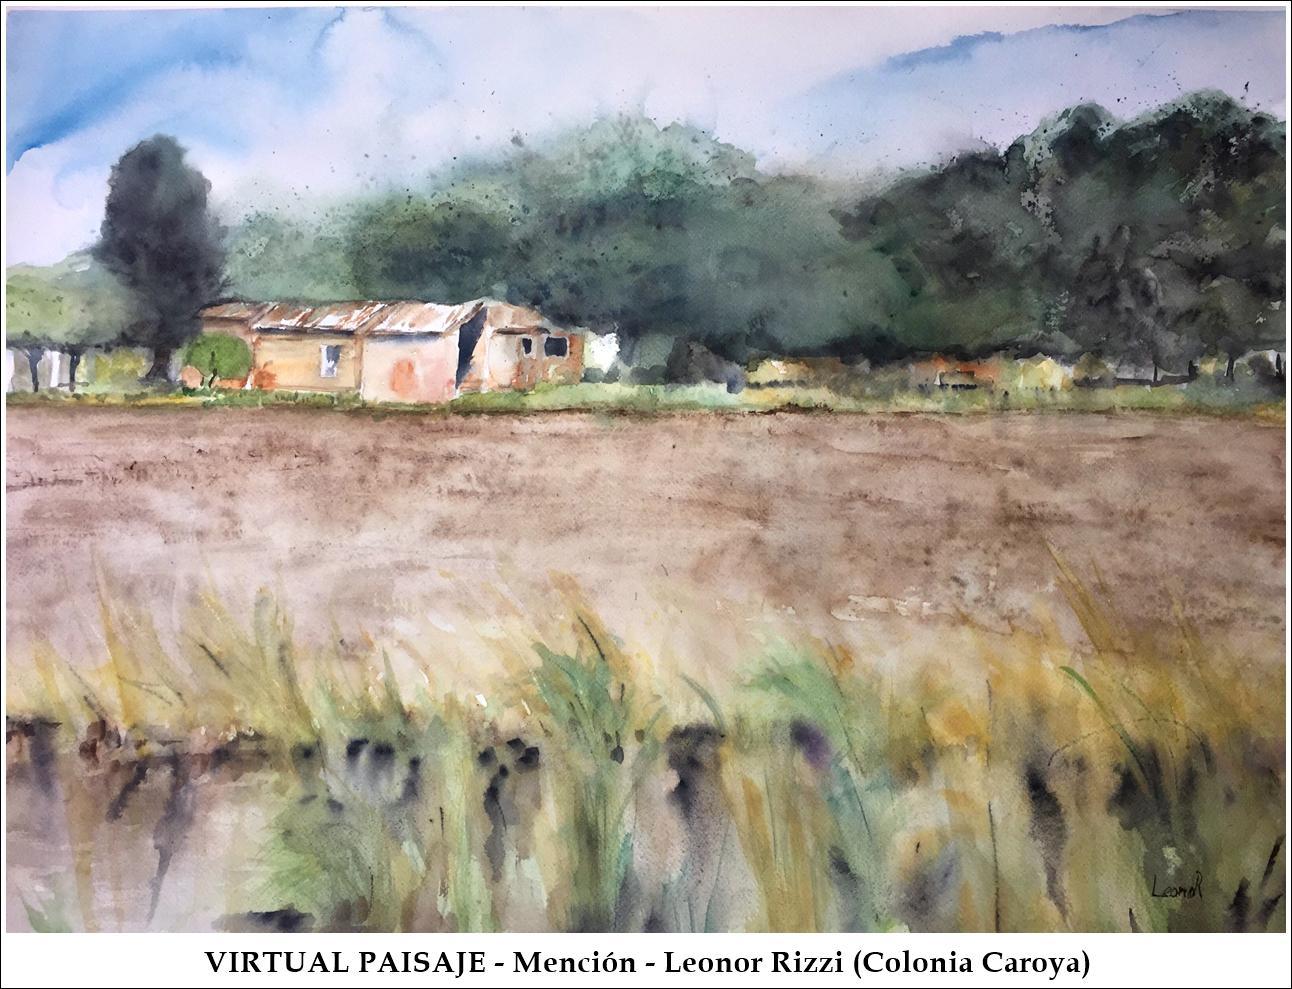 VirtualPaisaje - Mencion - LeonorRizzi